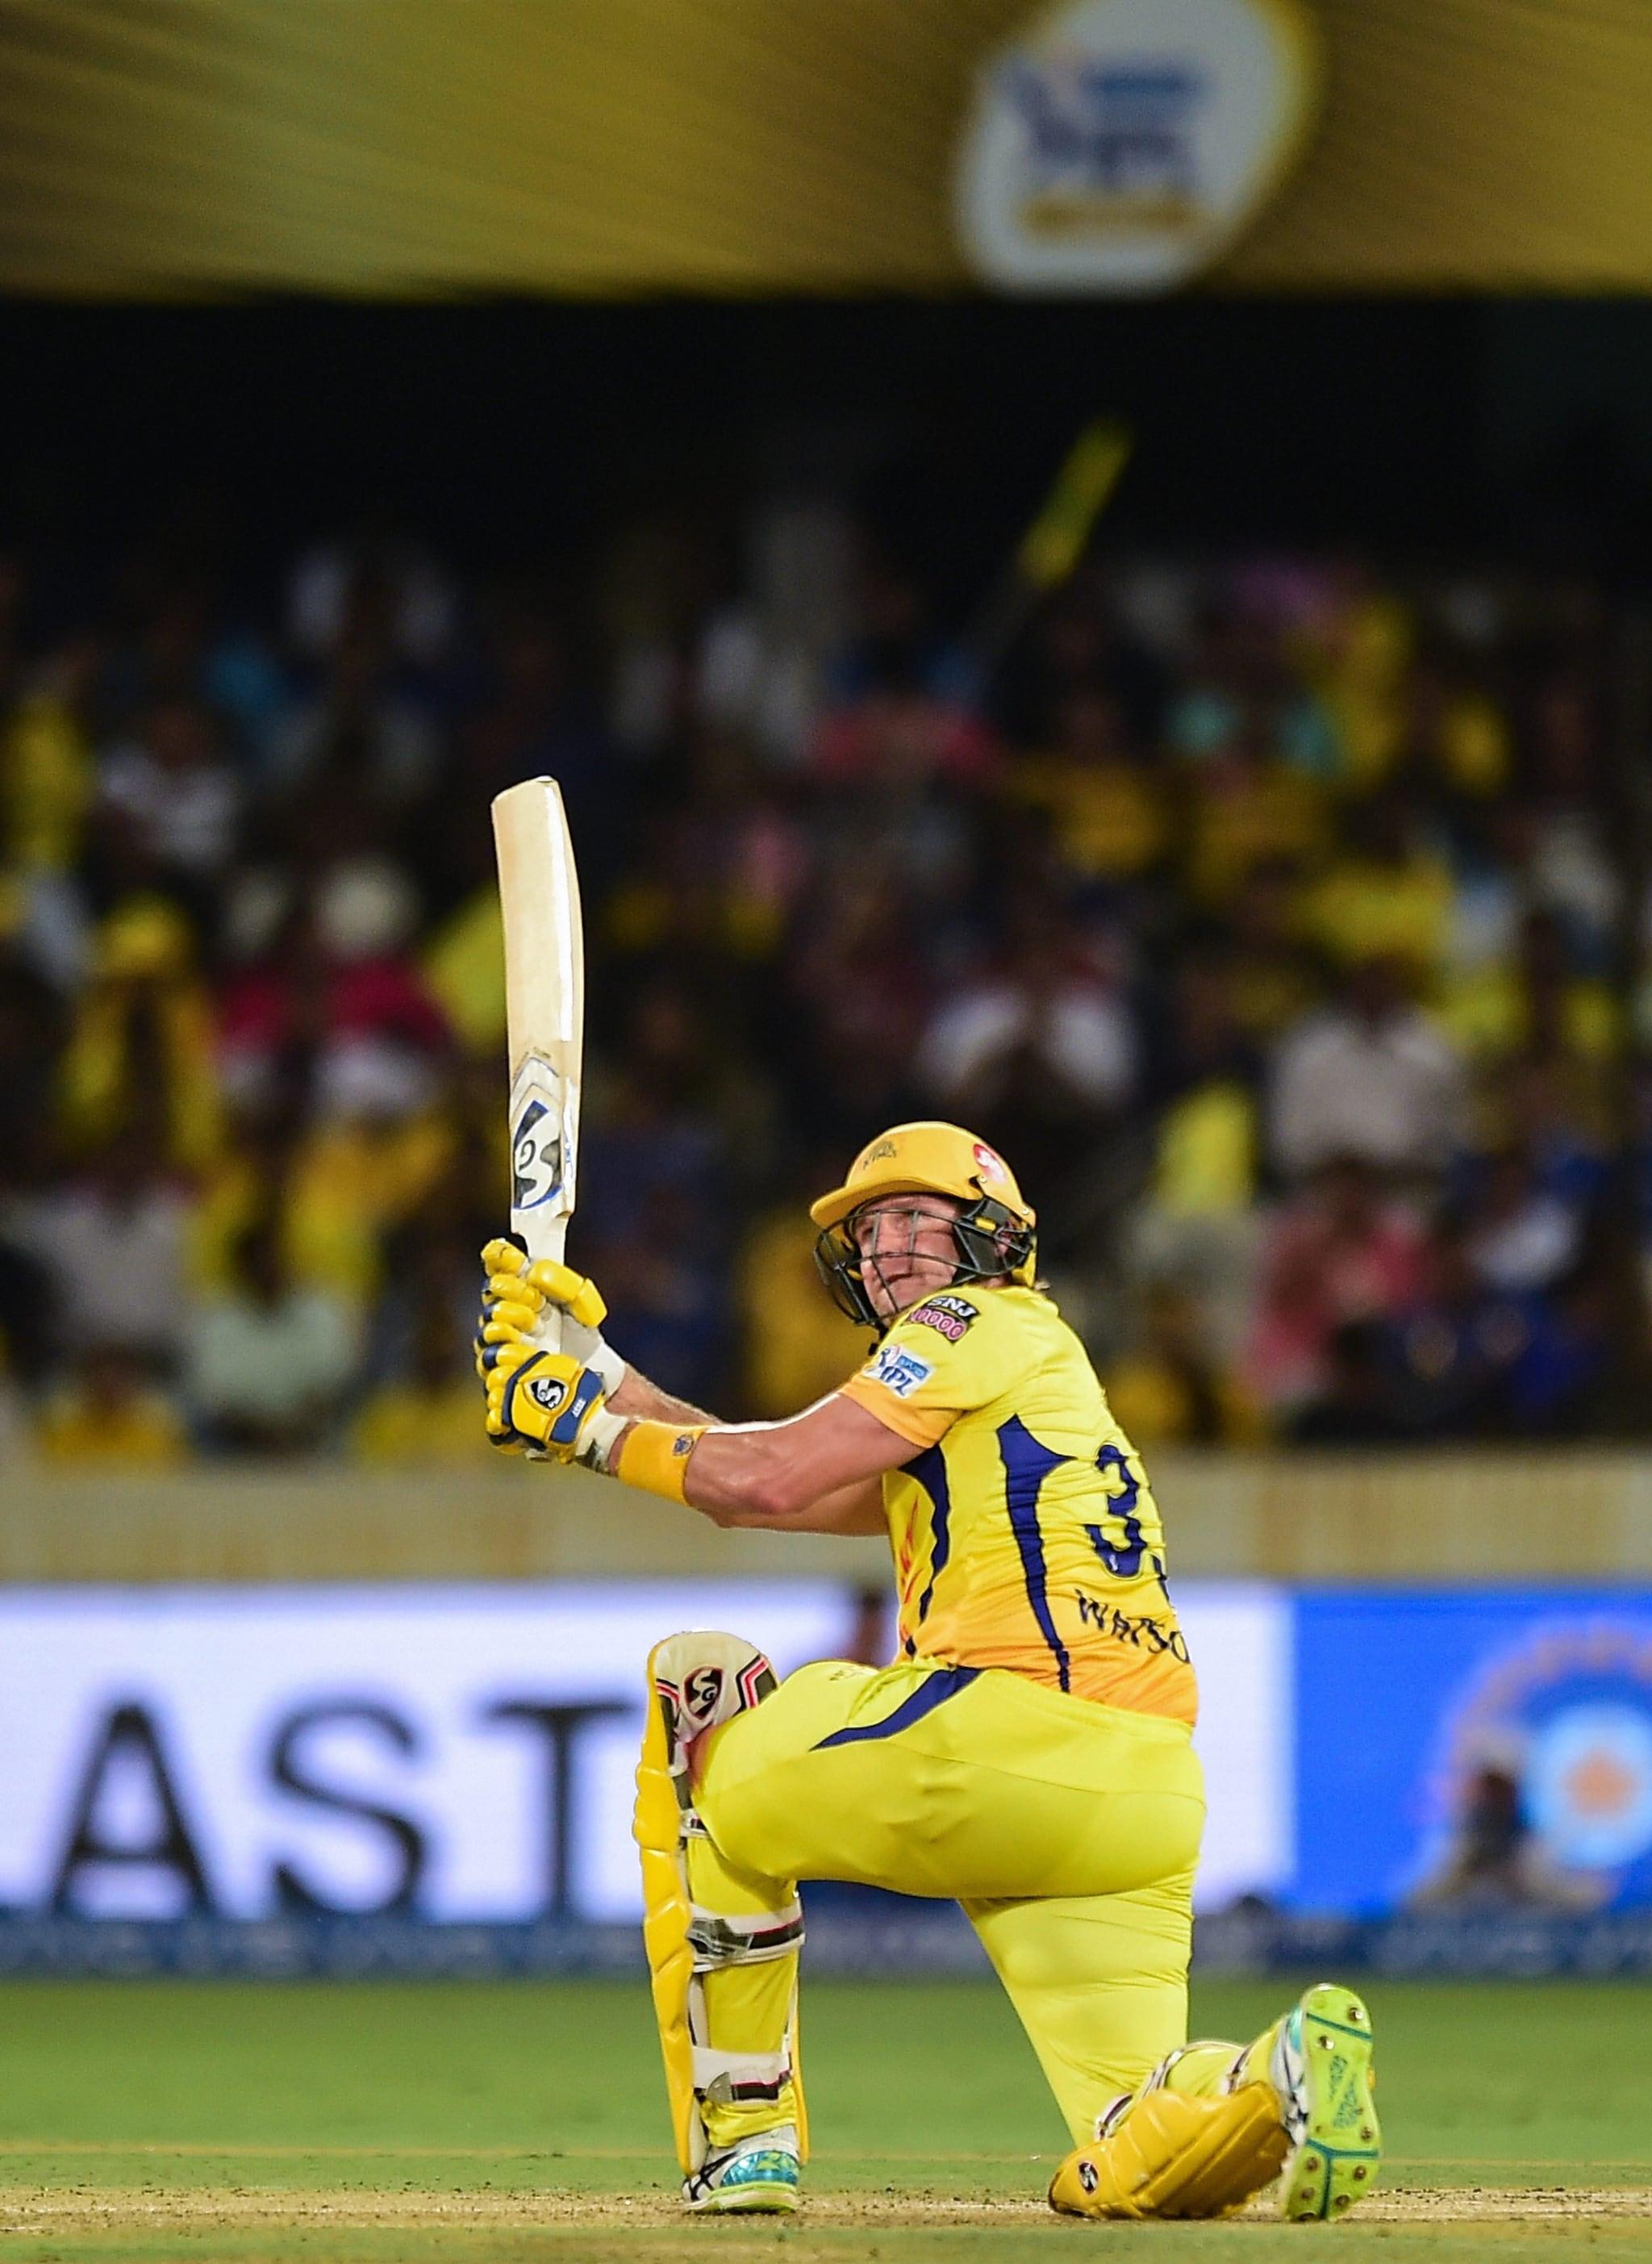 CSK opener Shane Watson plays a shot during the Indian Premier League 2019 final cricket match | PTI